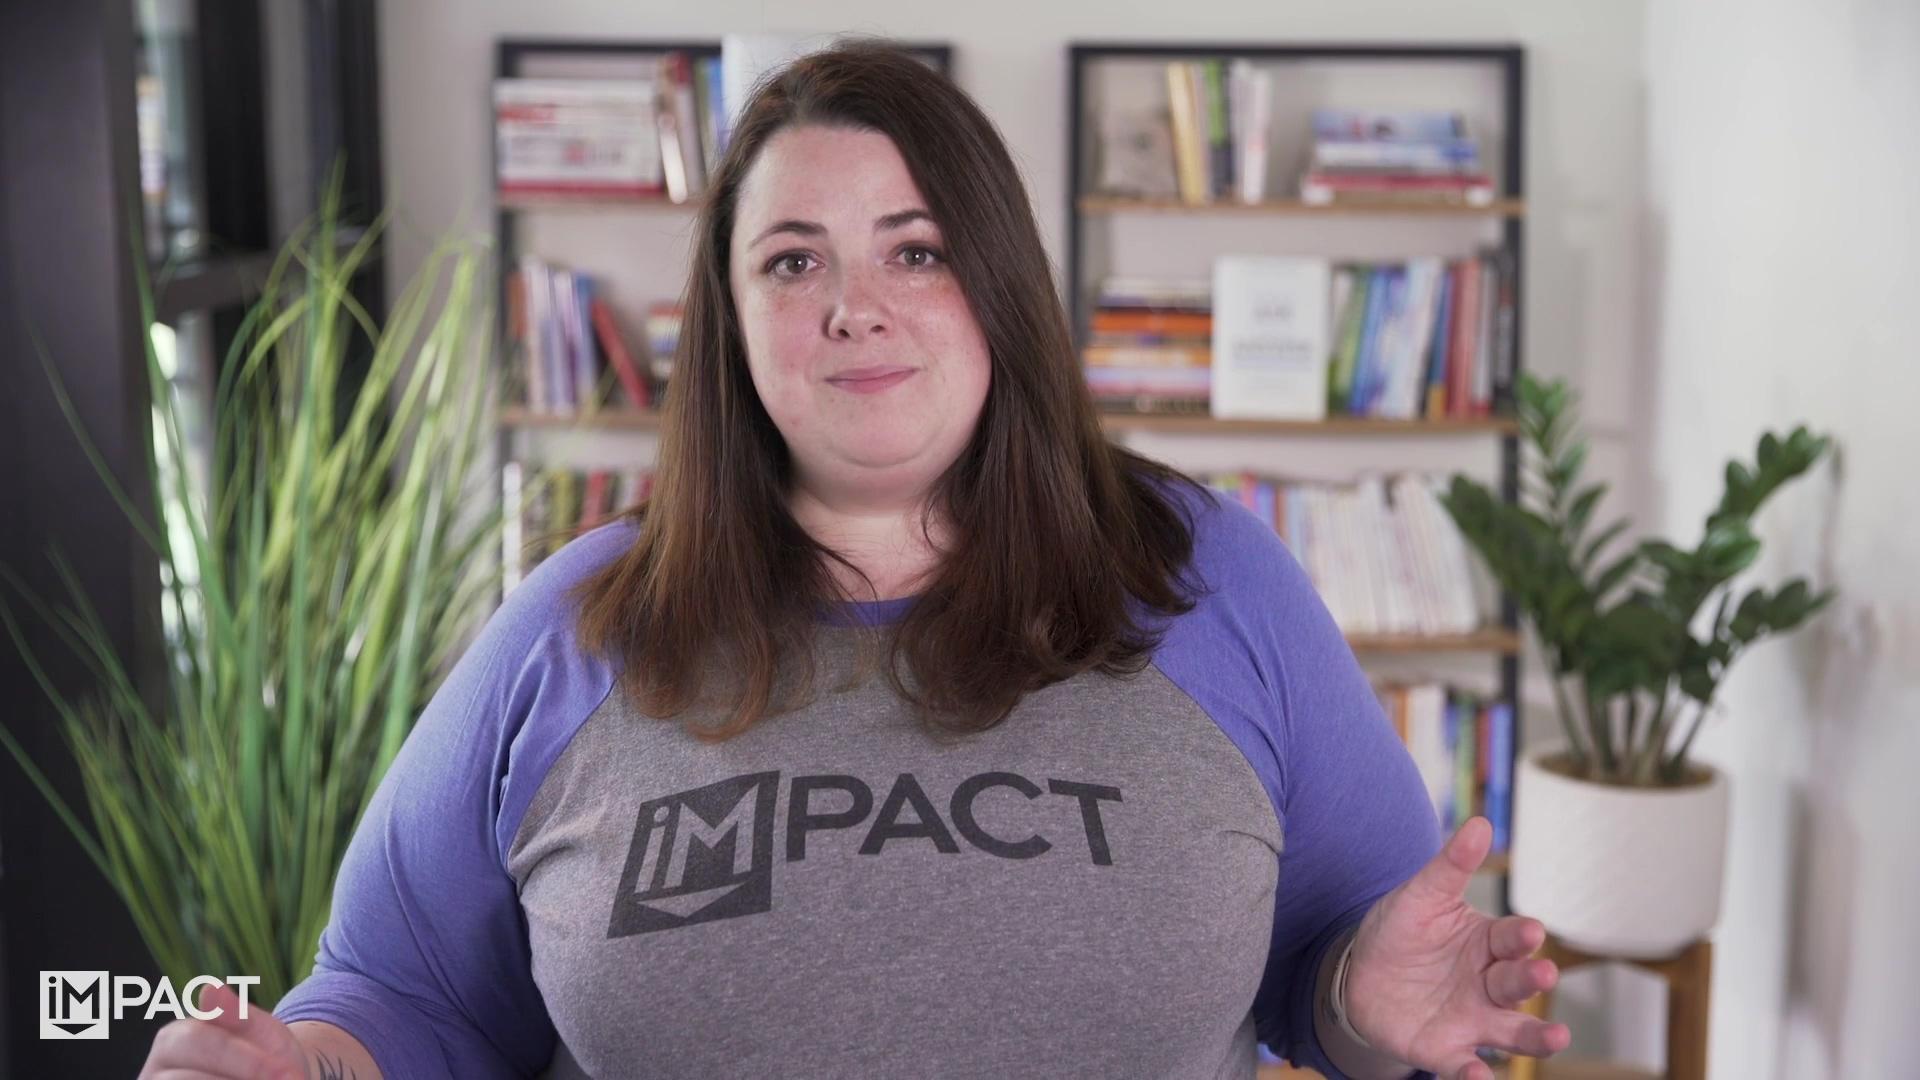 impact bad fit v3